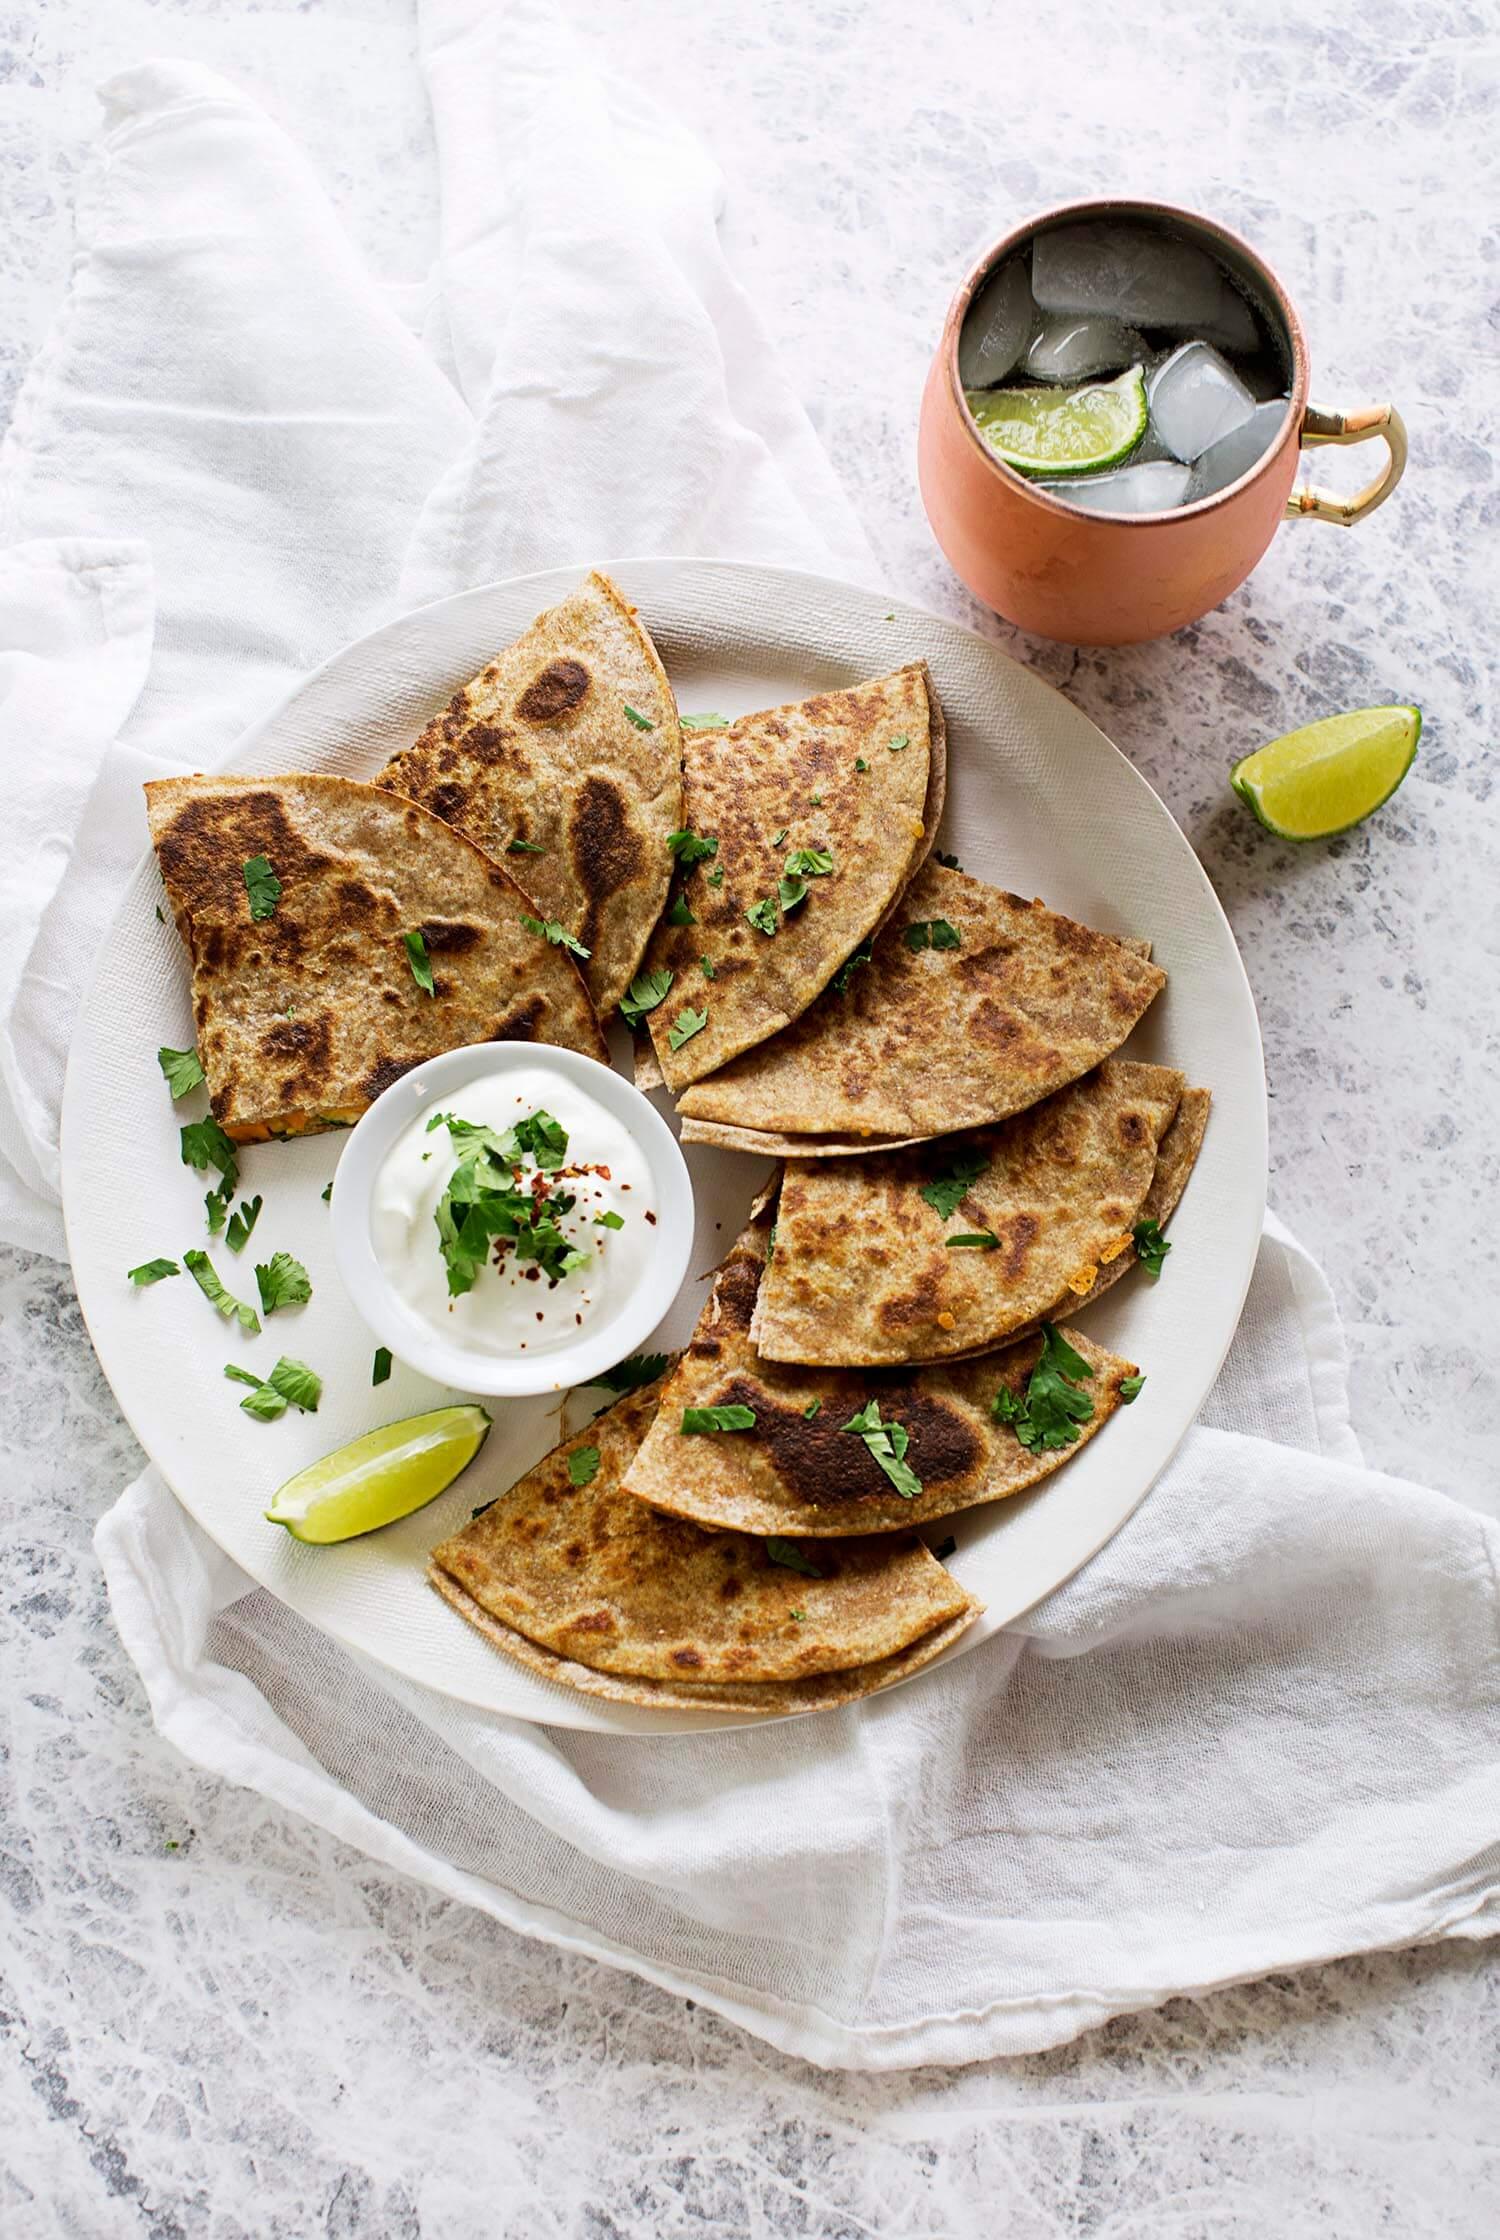 Sweet Potato and Kale Quesadillas (via abeautifulmess.com)